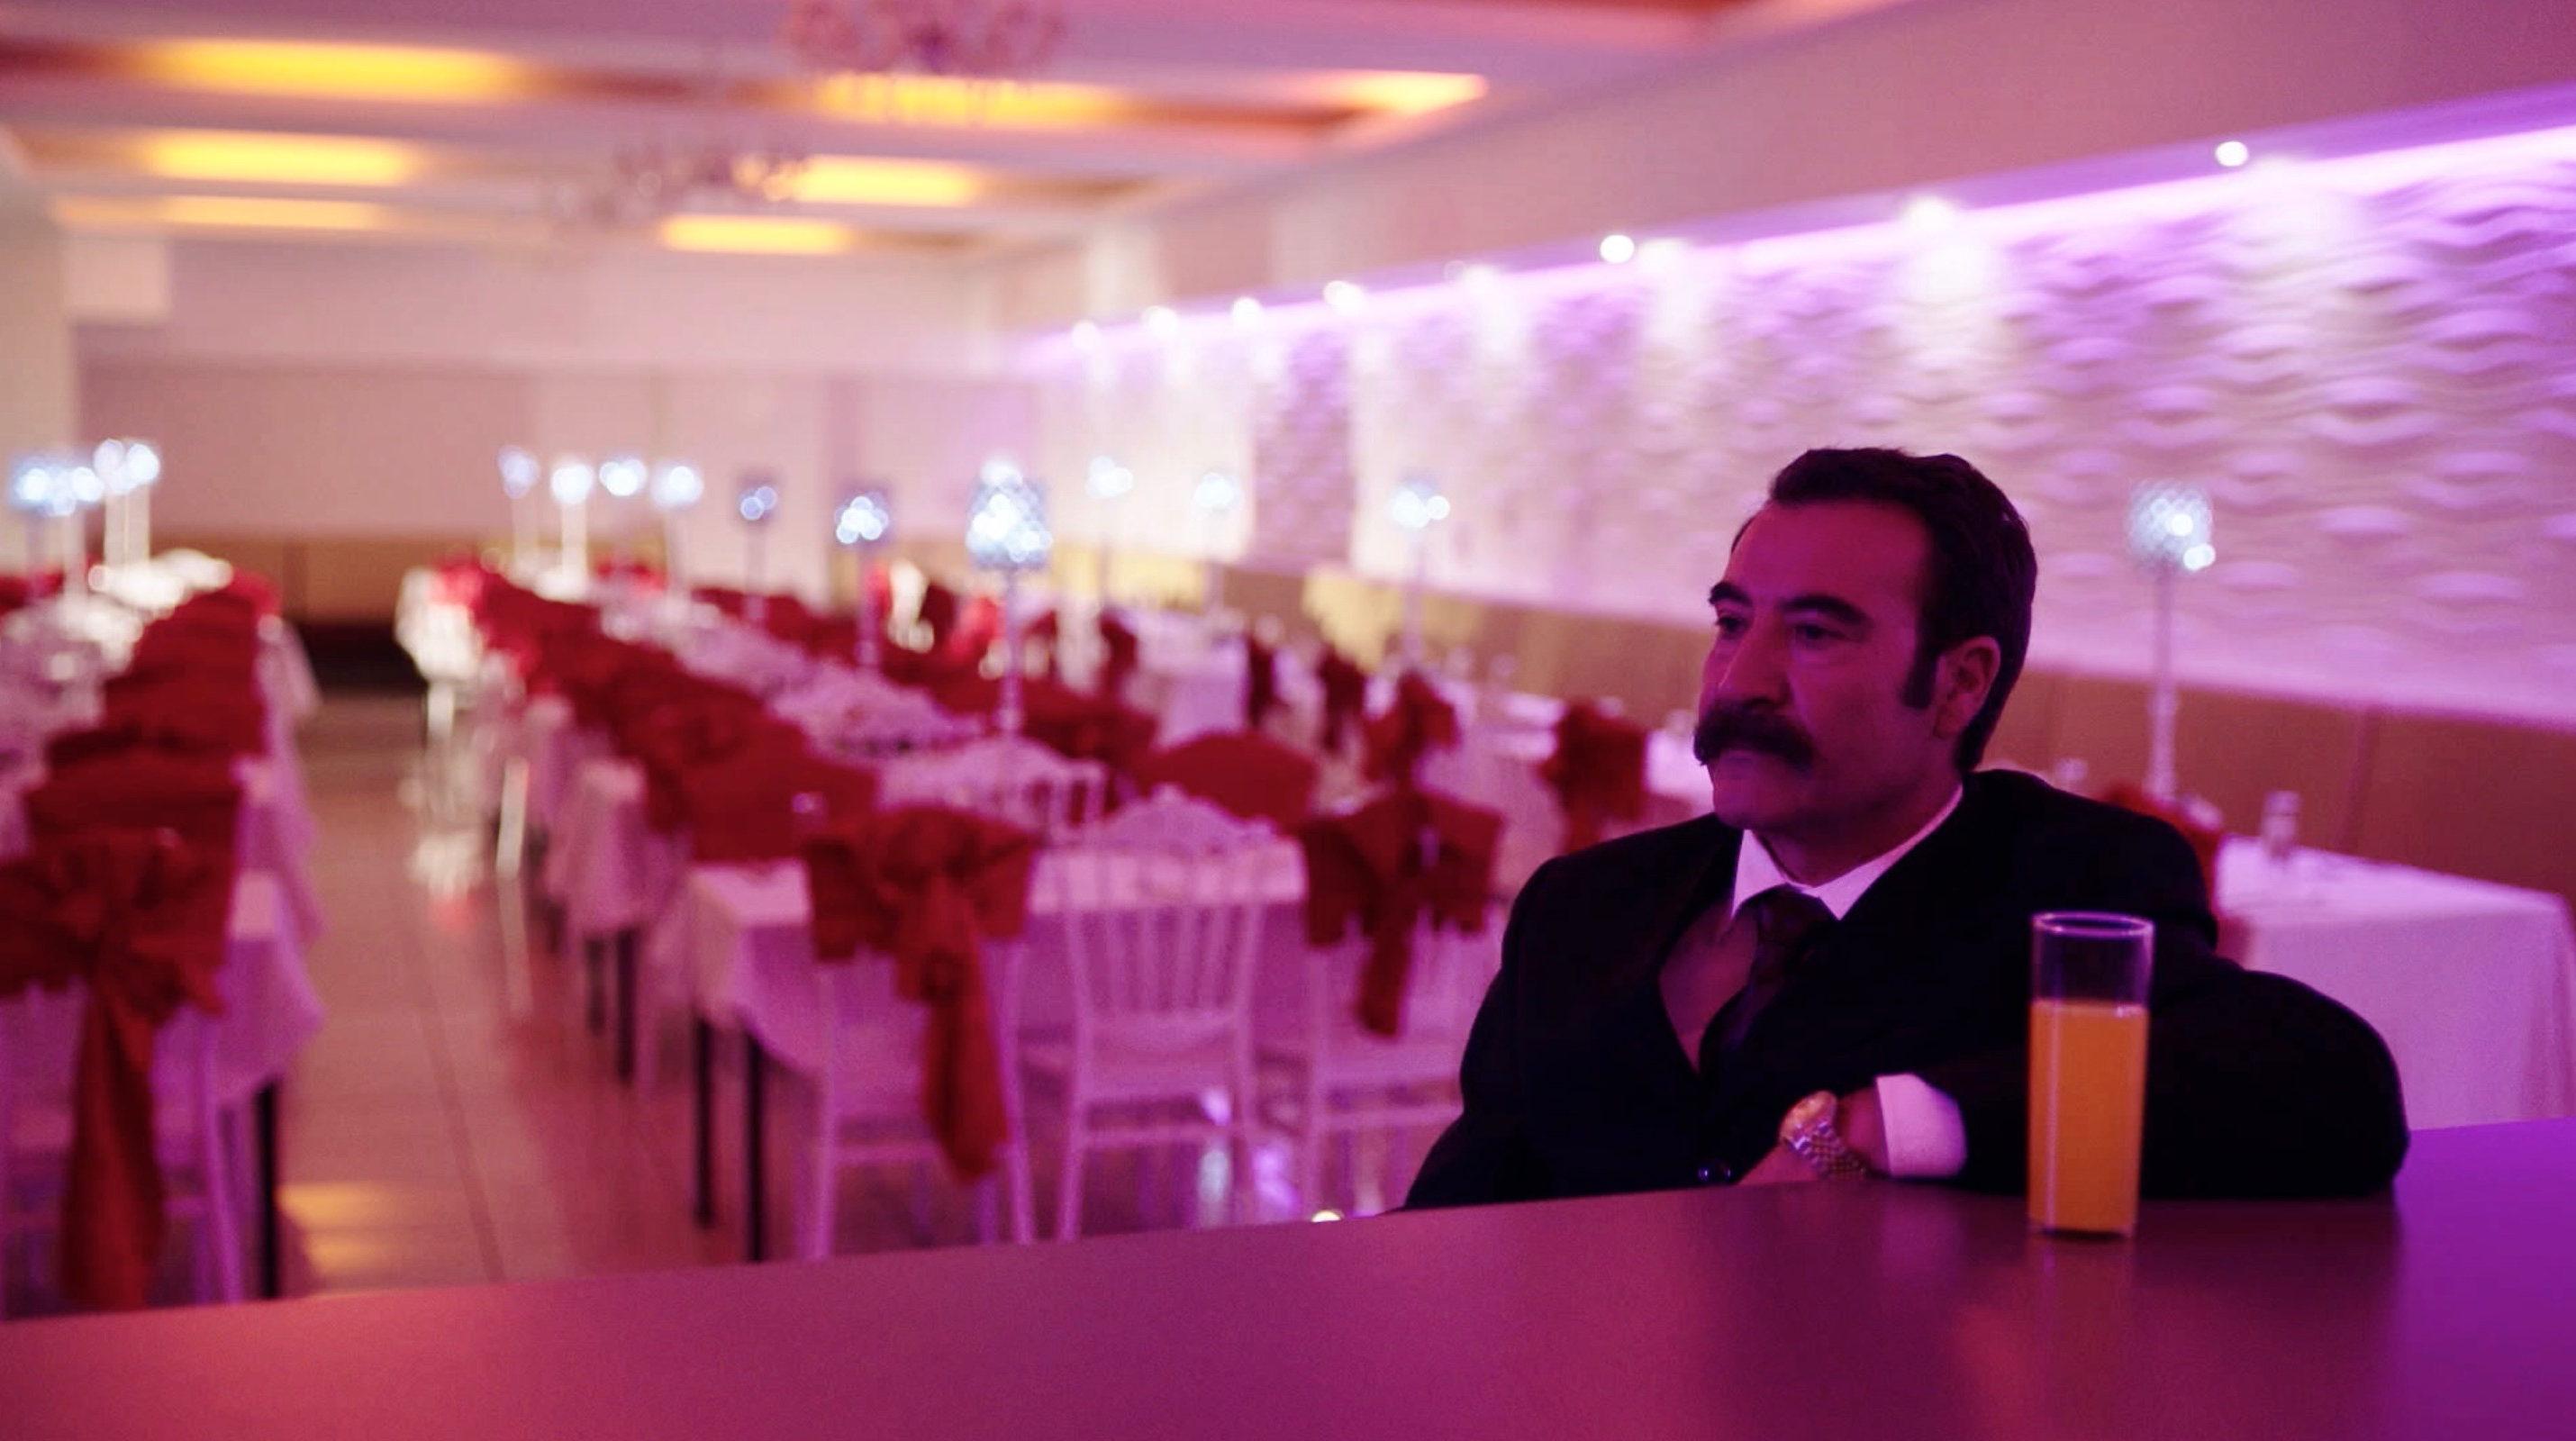 Nur eine Frau - A Regular Women - Aynurs Vater Rohat (Mürtüz Yolcu) - Regie Sherry Hormann - Kamera Judith Kaufmann